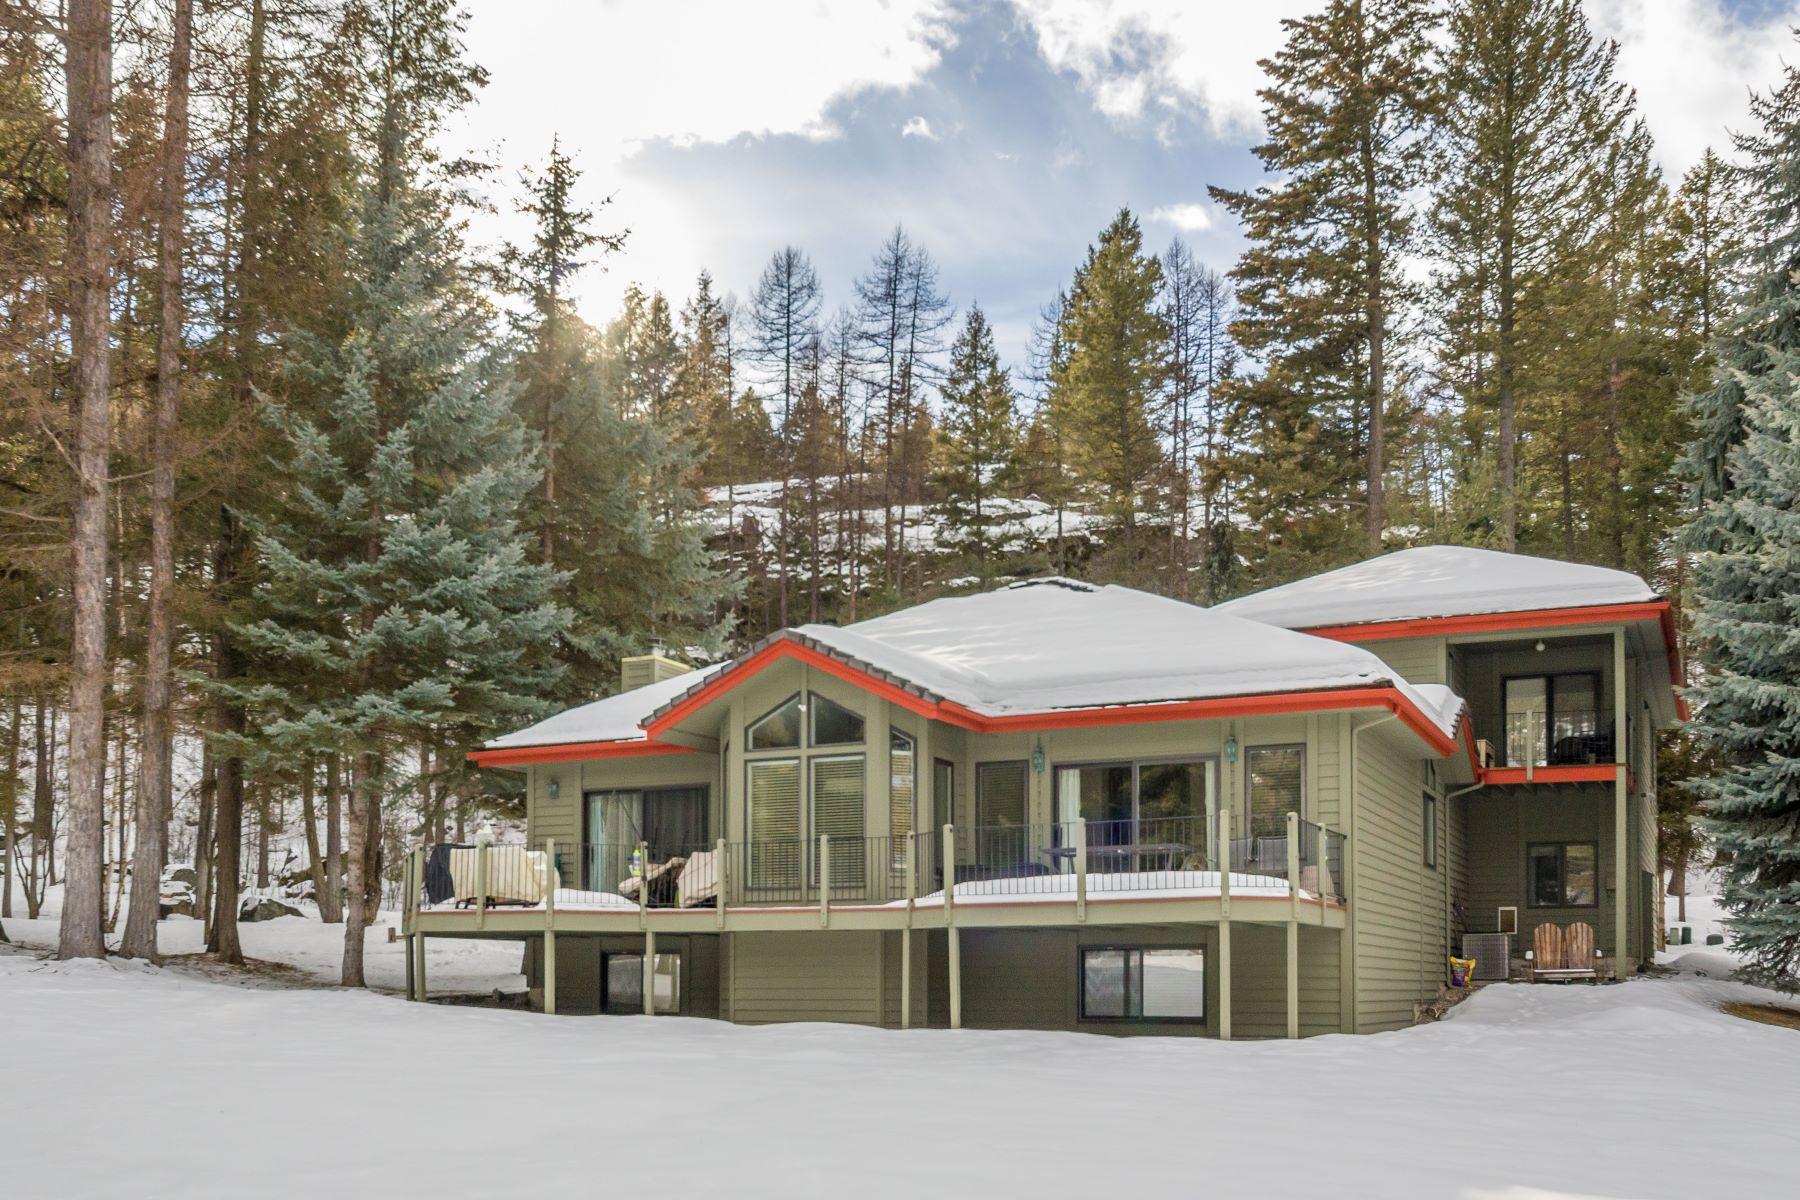 Single Family Home for Sale at 163 Golf Terr , Bigfork, MT 59911 163 Golf Terr Bigfork, Montana 59911 United States